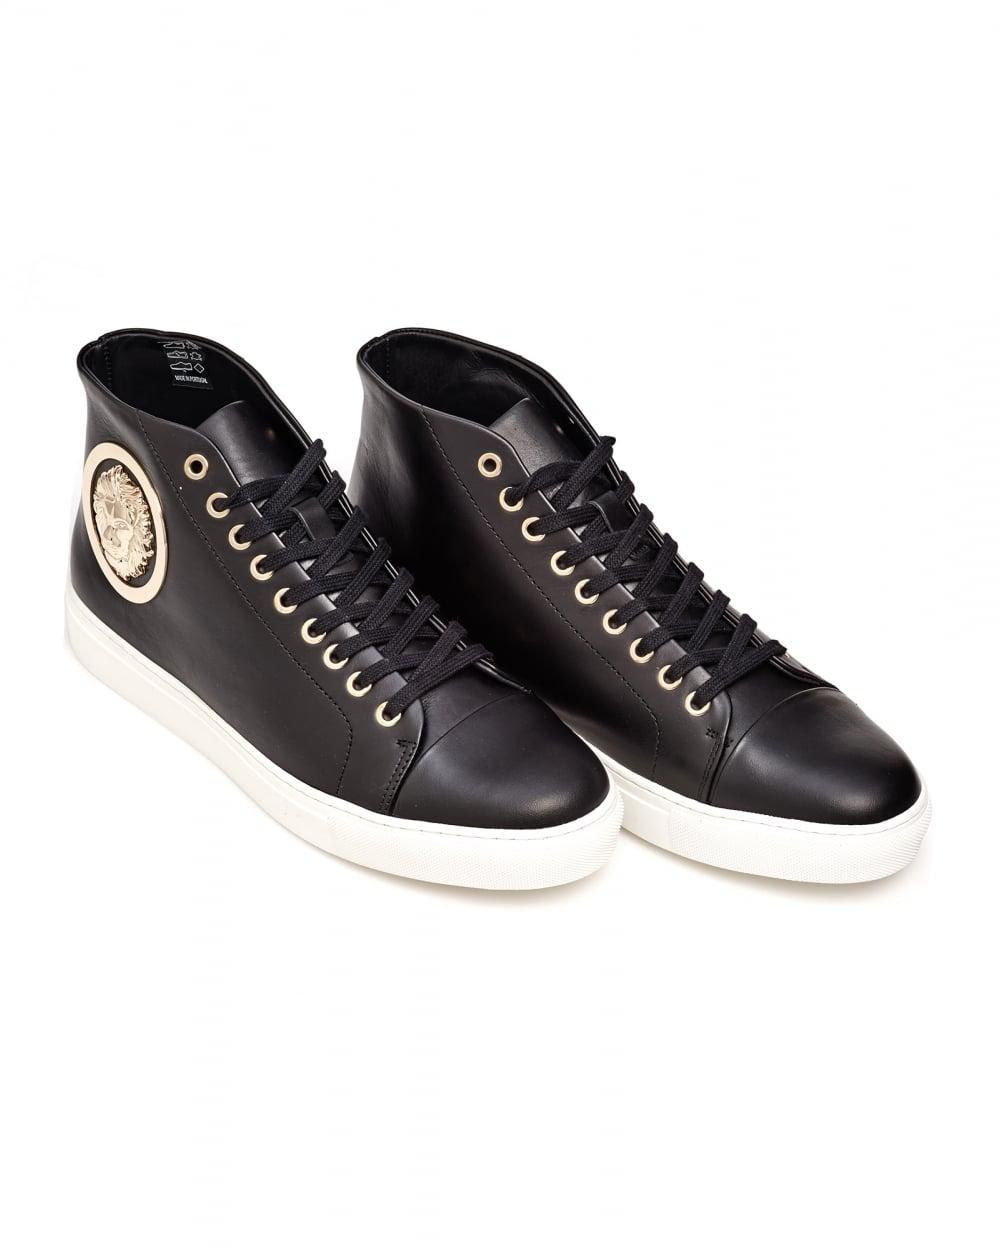 Versus Versace Mens Lionhead Logo Sneaker, Rubber Sole Black High Tops d5305134c1d